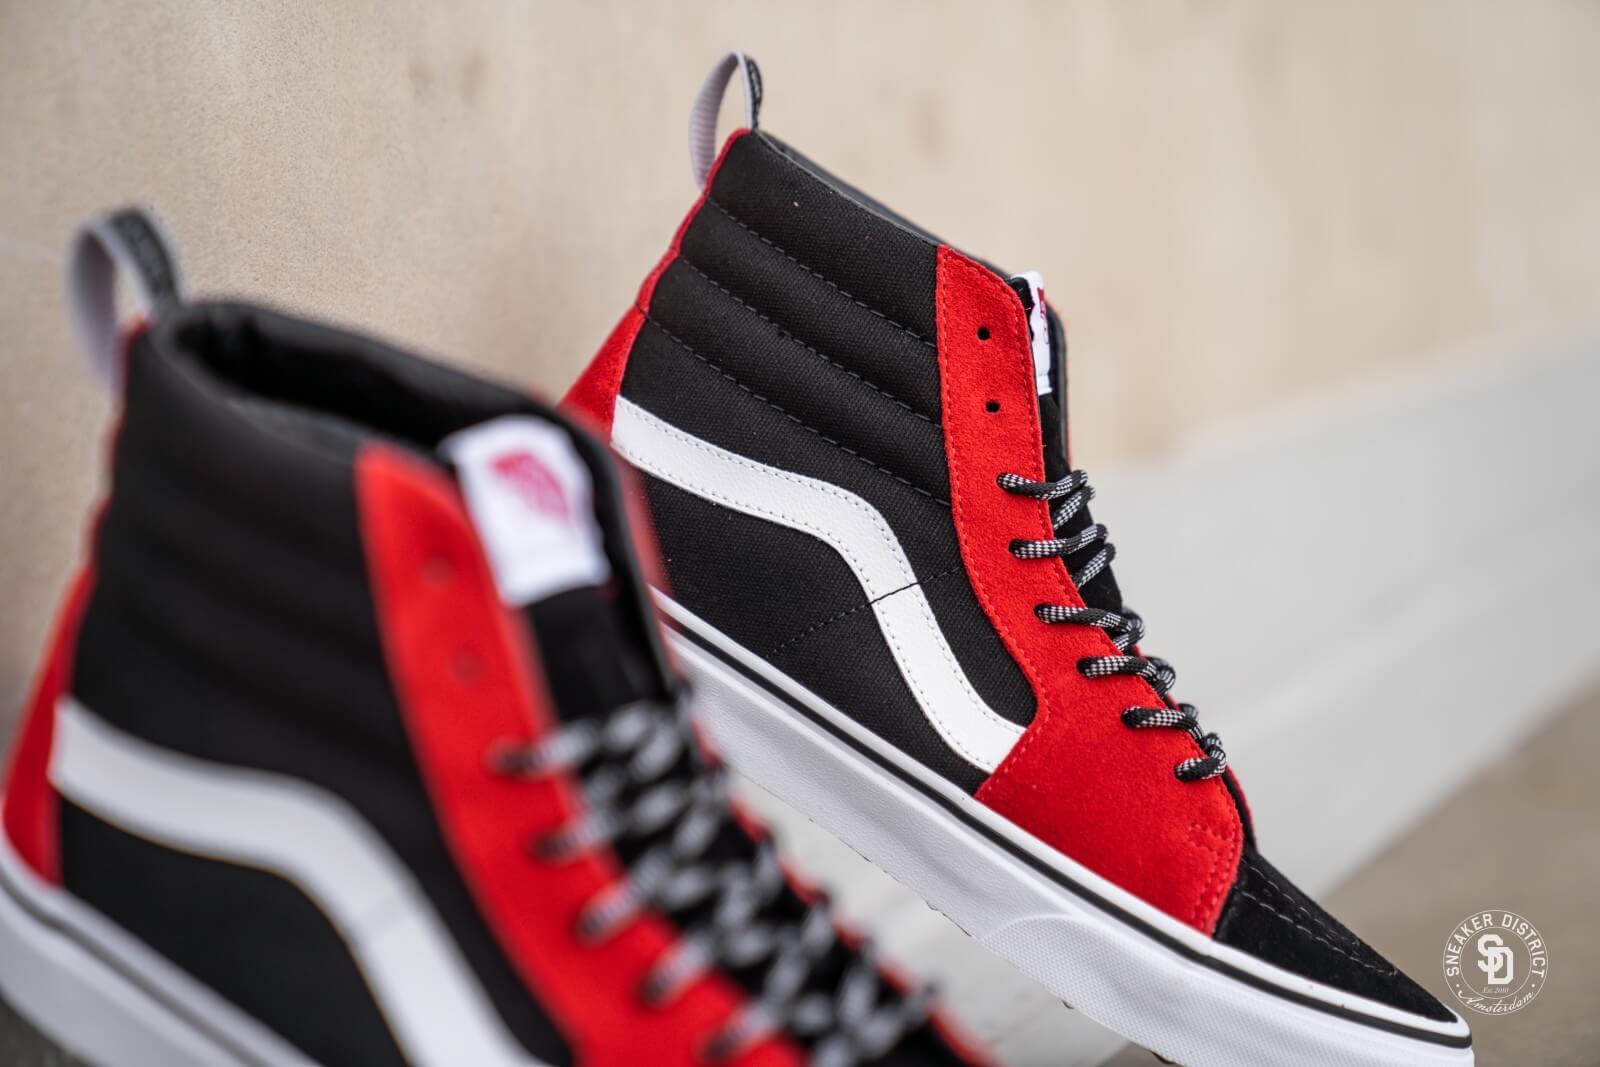 Vans Sk8-Hi Otw Webbing Red/Black-White